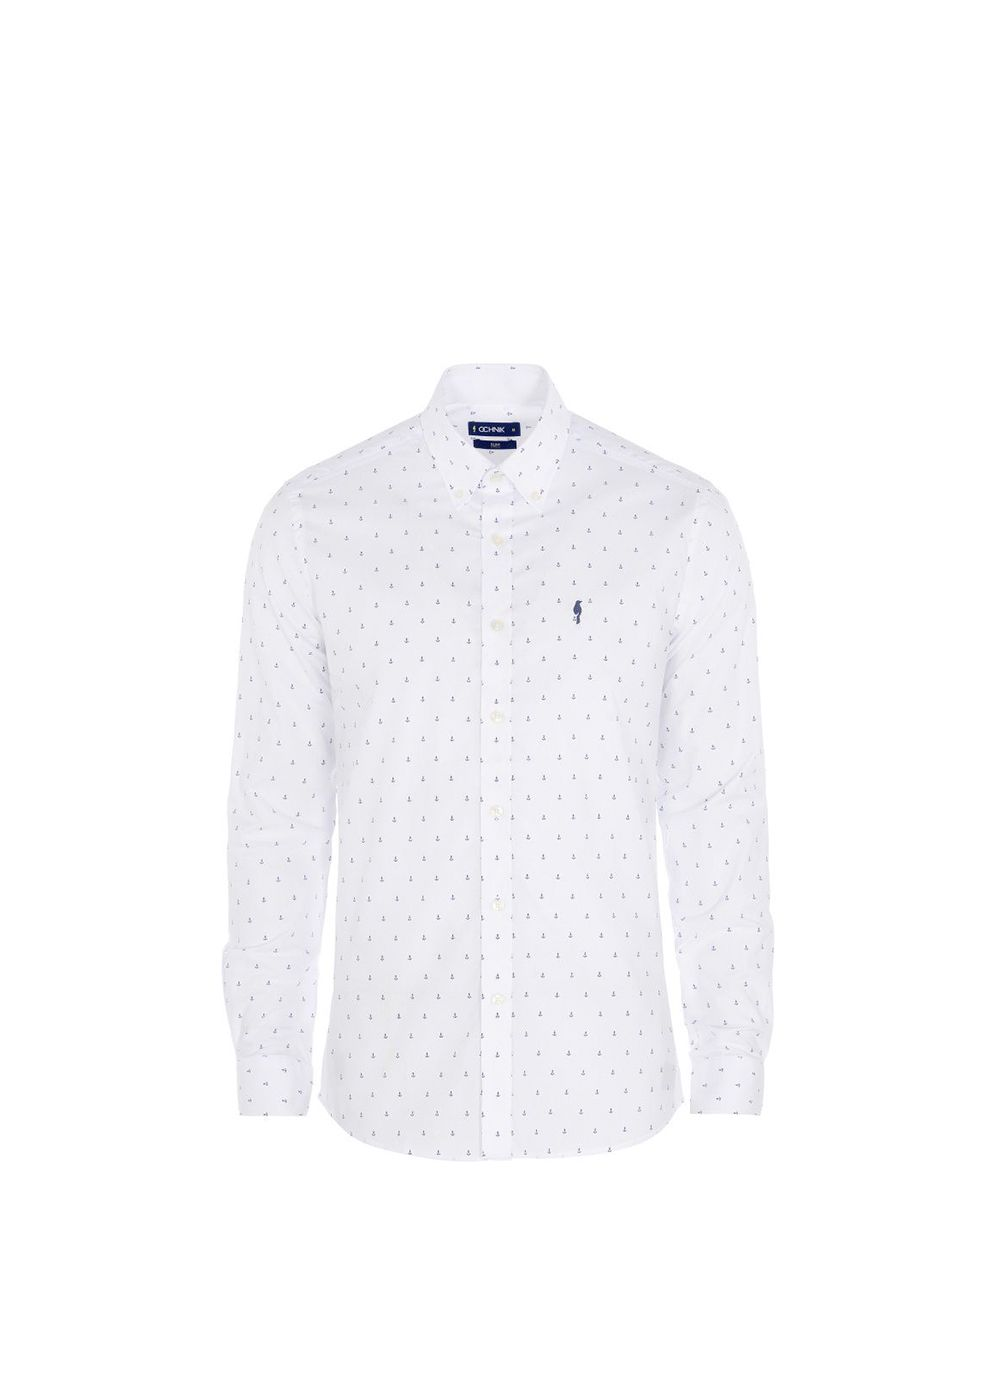 Koszula męska KOSMT-0183-11(W20)